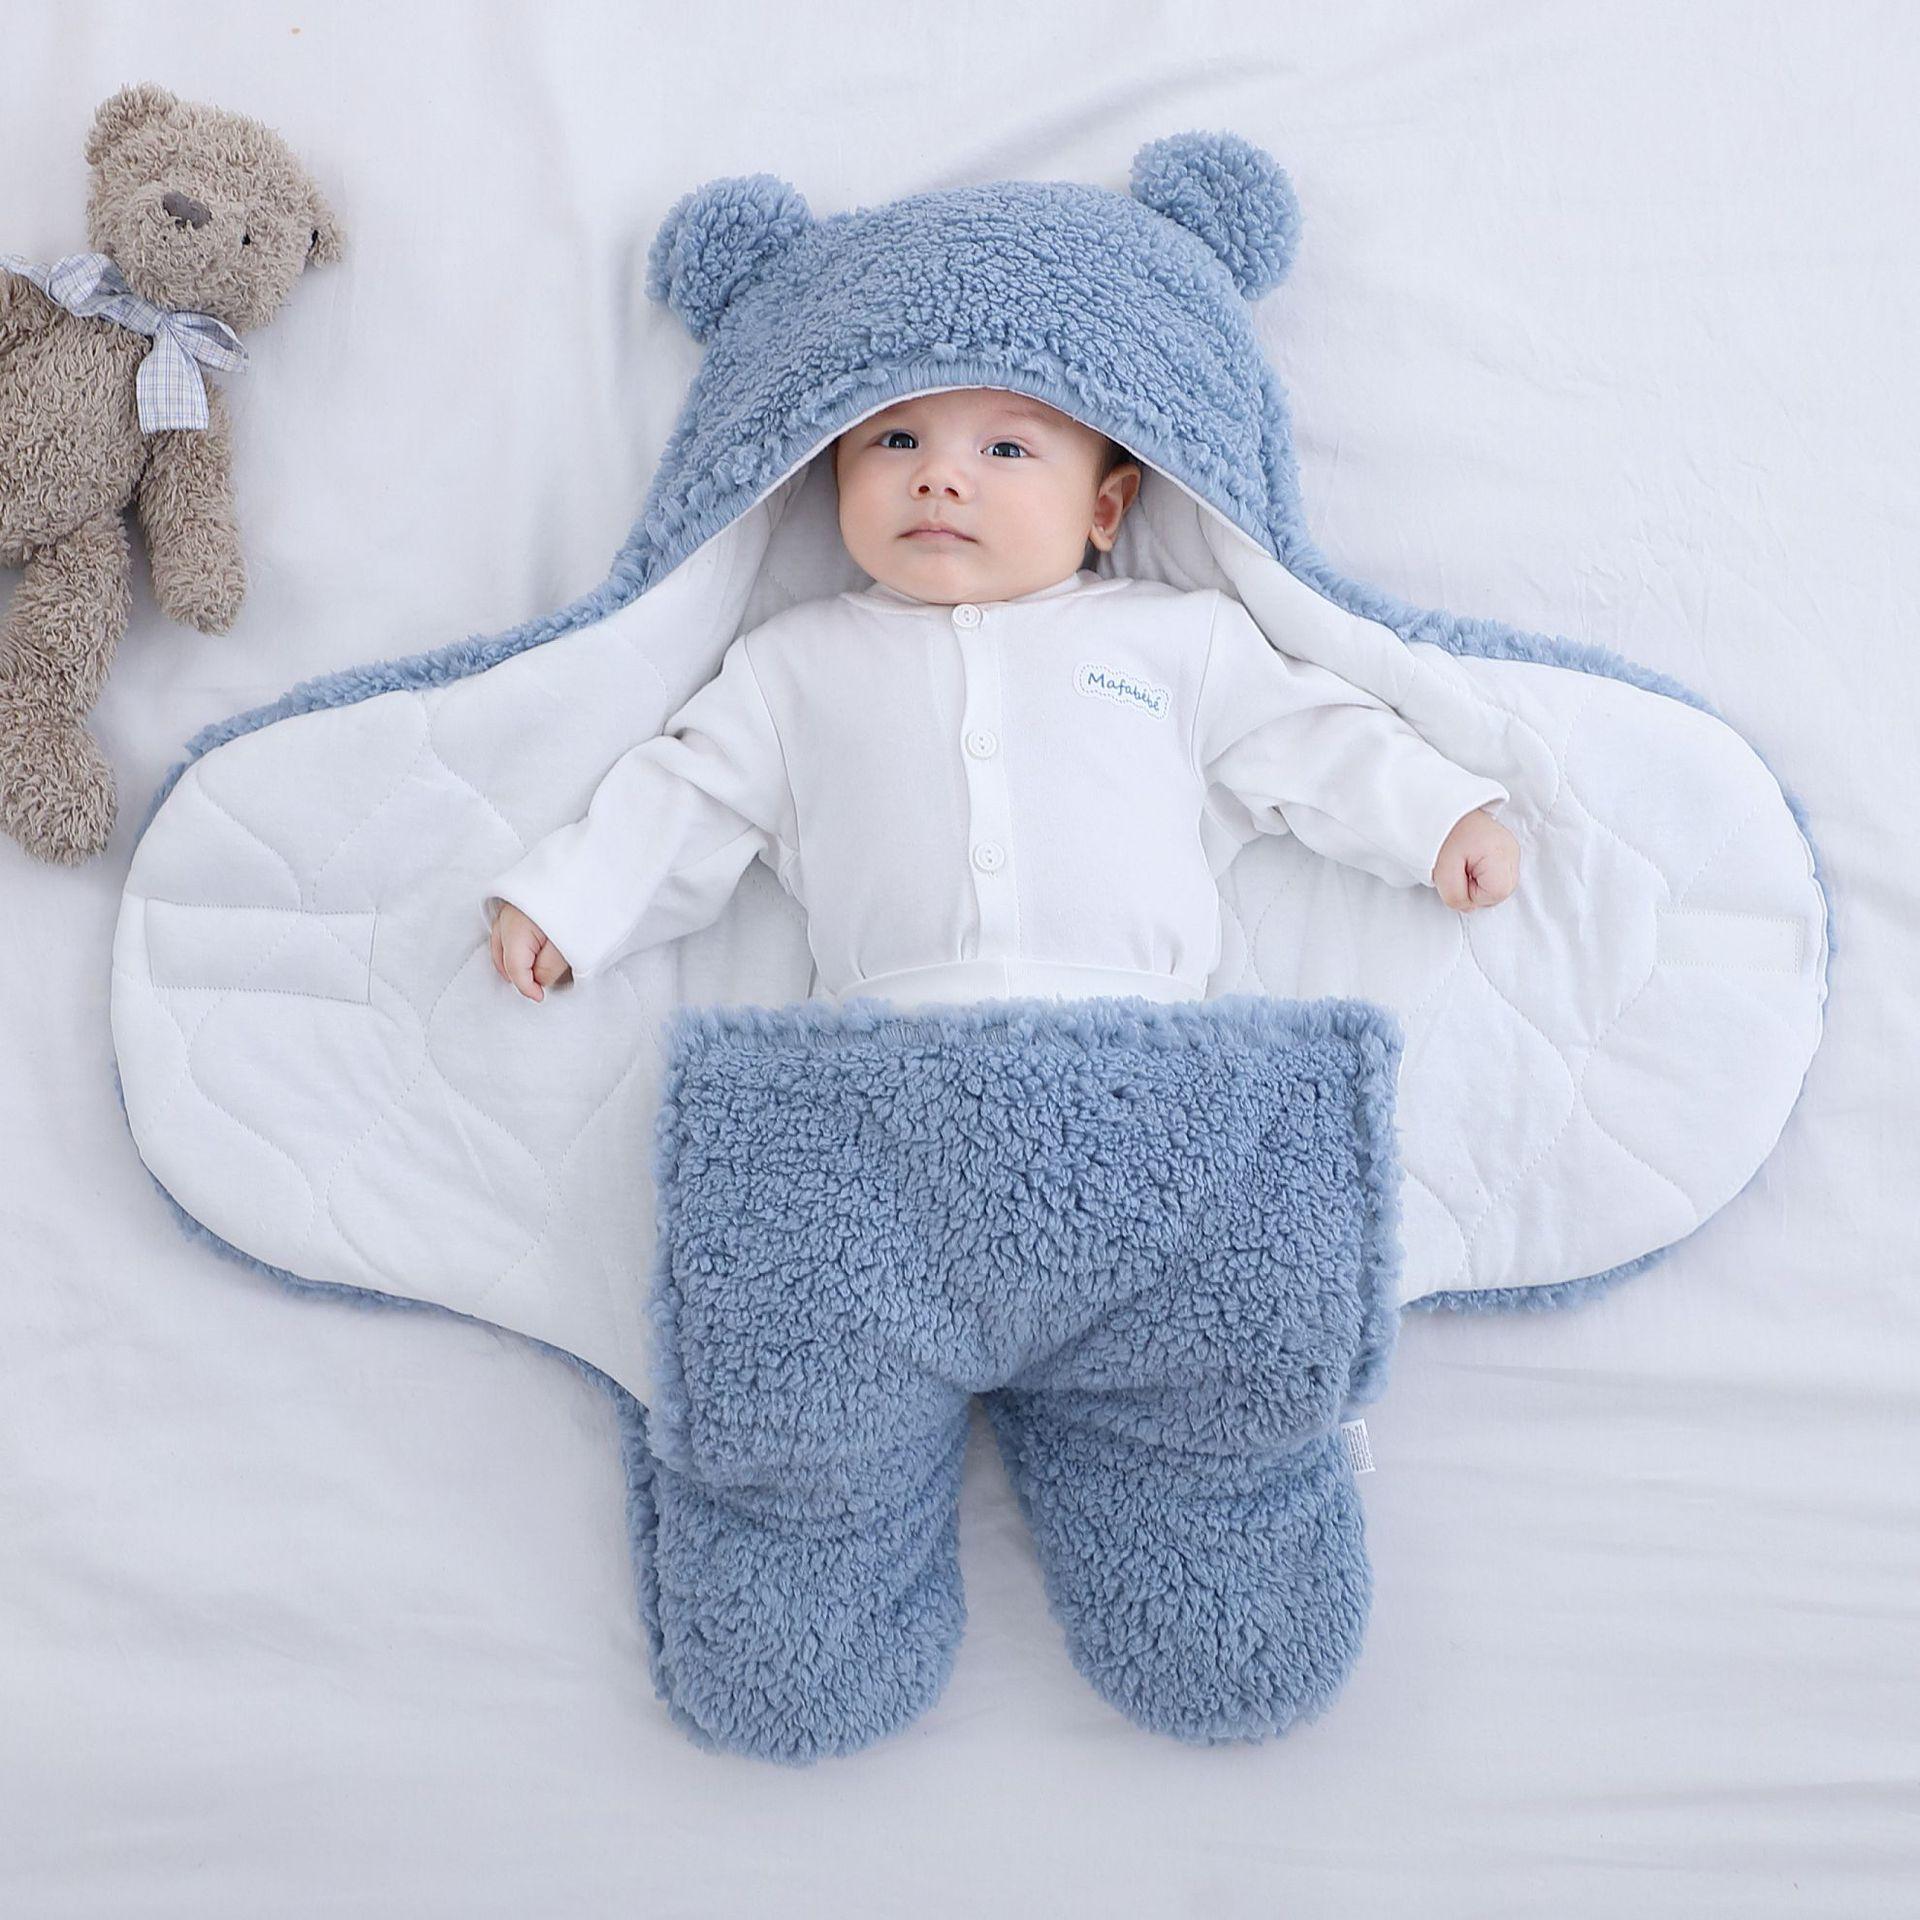 Baby Sleeping Bag Ultra Soft Fluffy Fleece Newborn Receiving Blanket Infant Boys Girls ClothesSleeping Nursery Wrap Swaddle